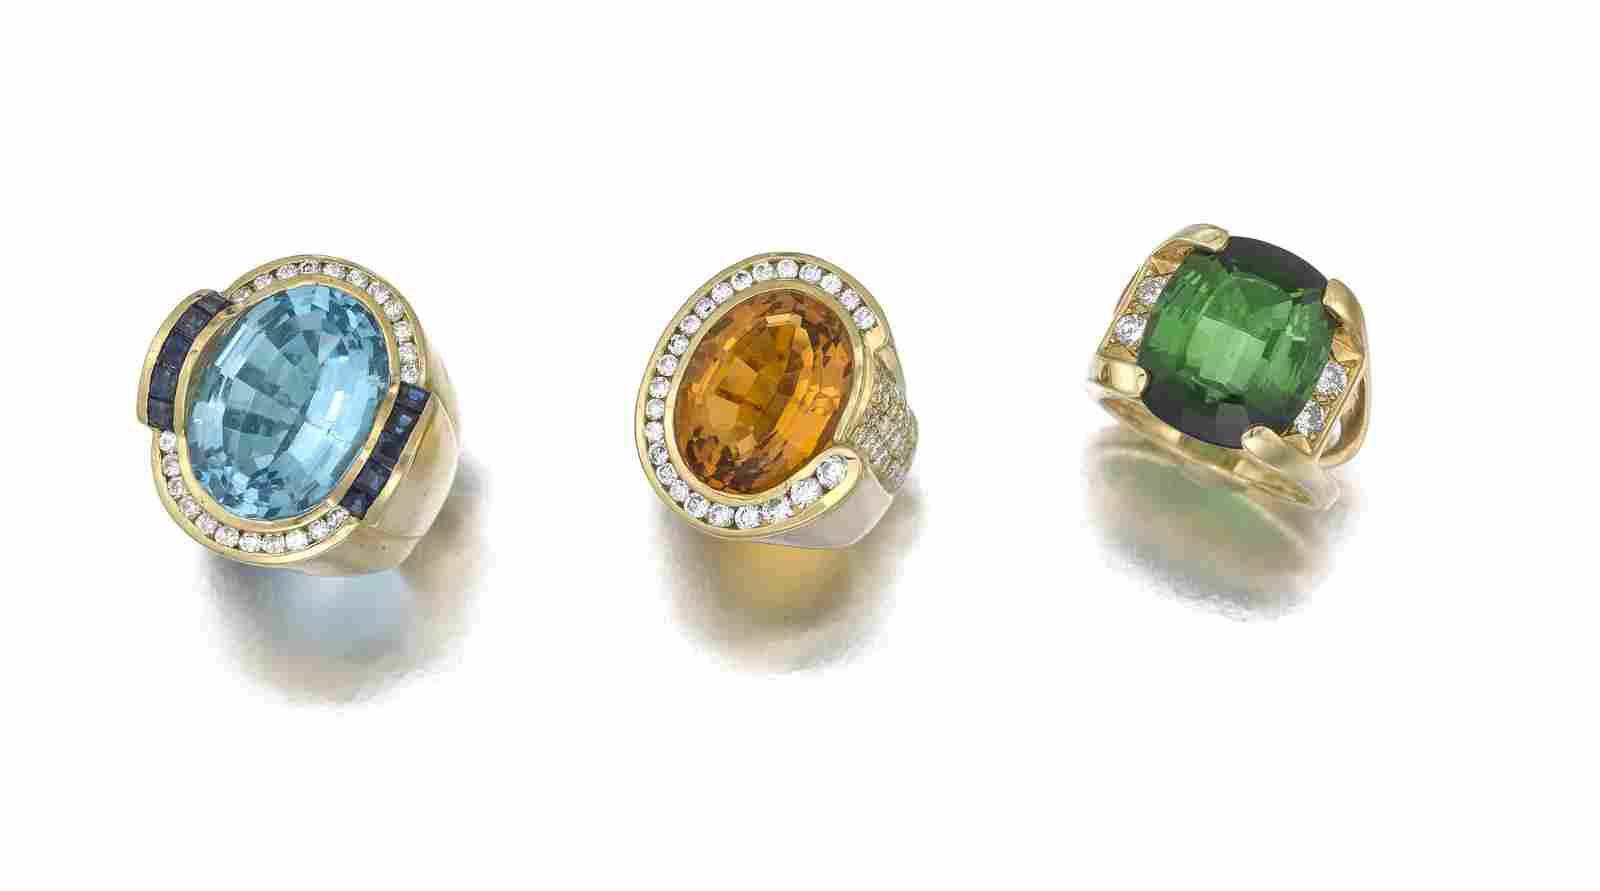 Three diamond and gem-set rings